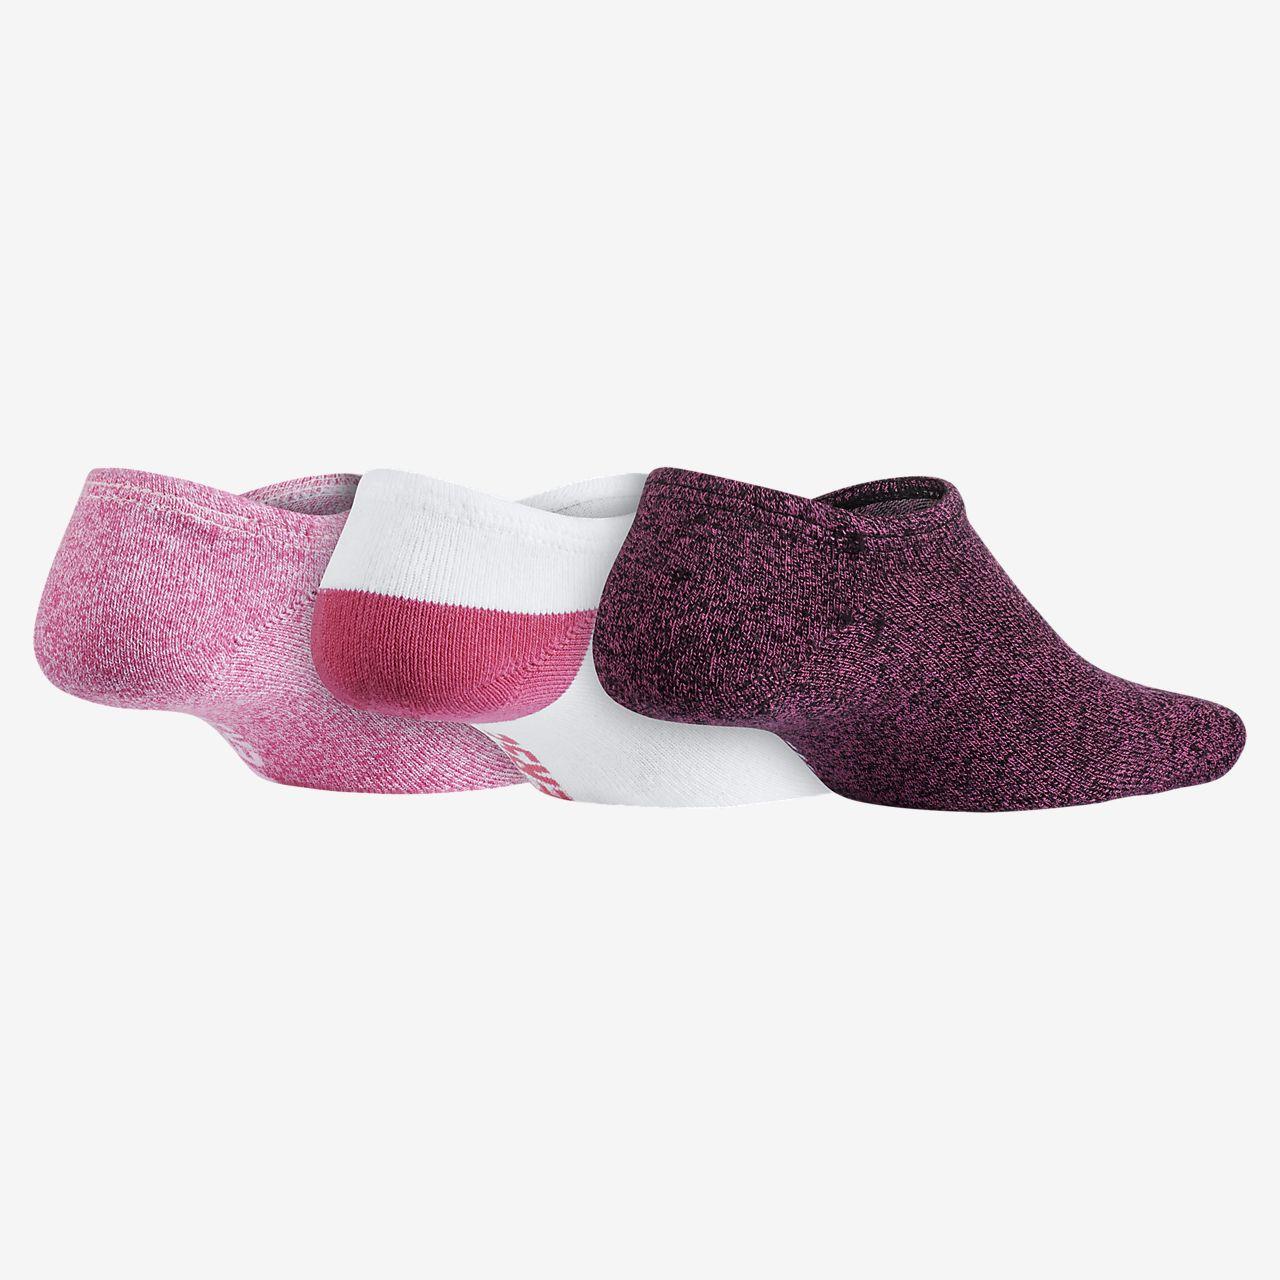 converse no show socks. converse space dye no-show socks (3 pair) no show